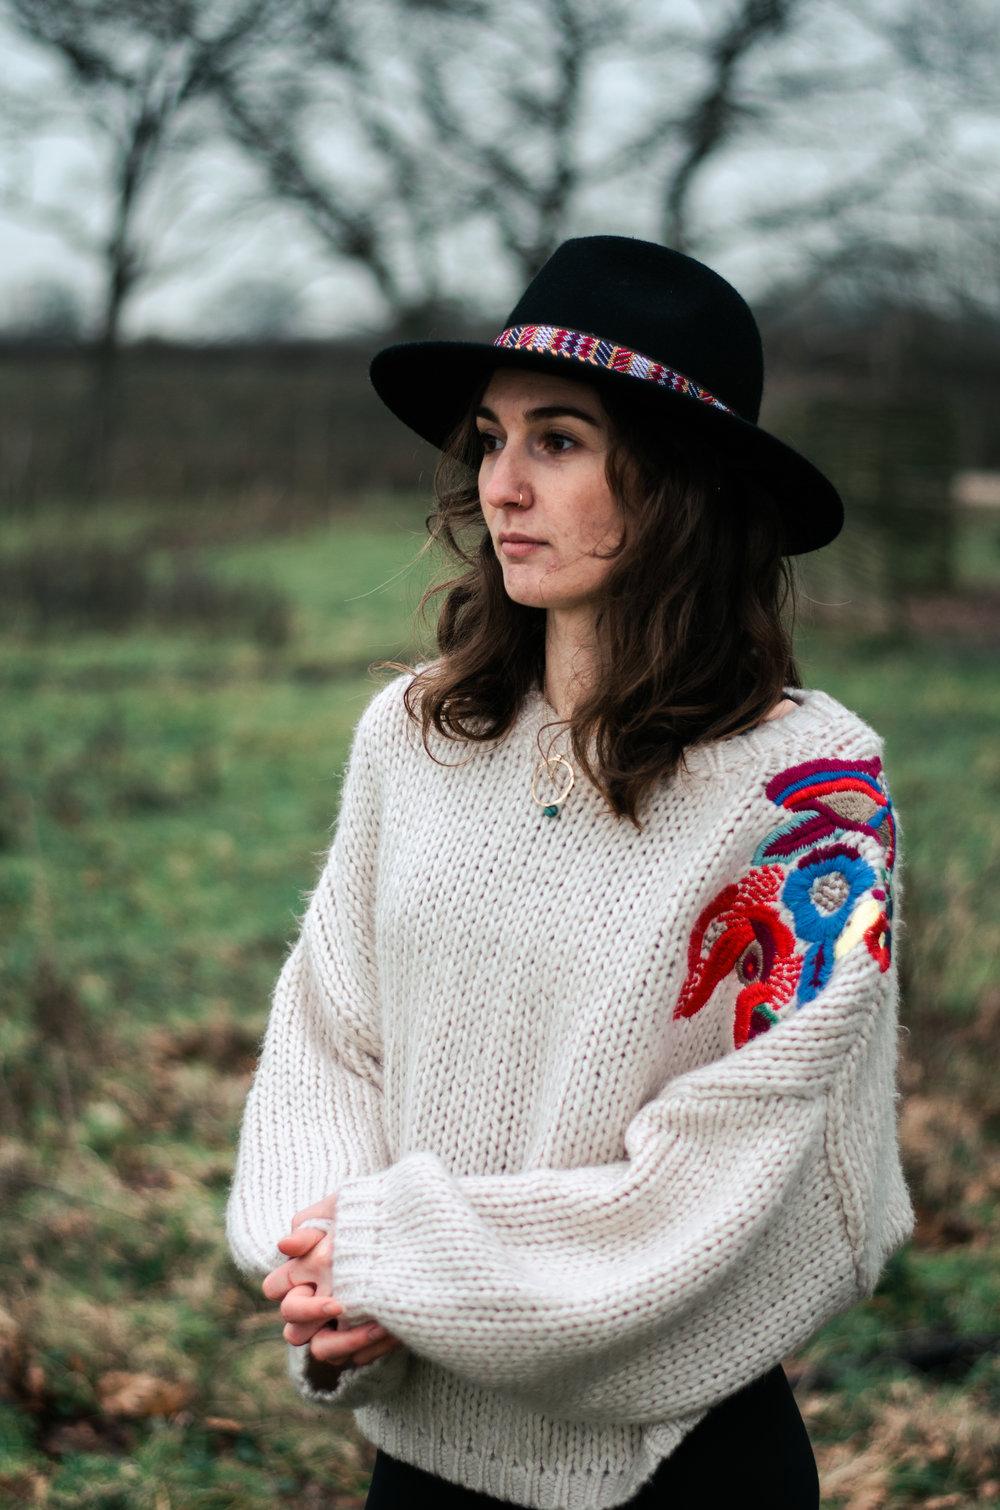 Chloe - Portraits - Aiste Saulyte Photography - 2018-01-05-99.jpg